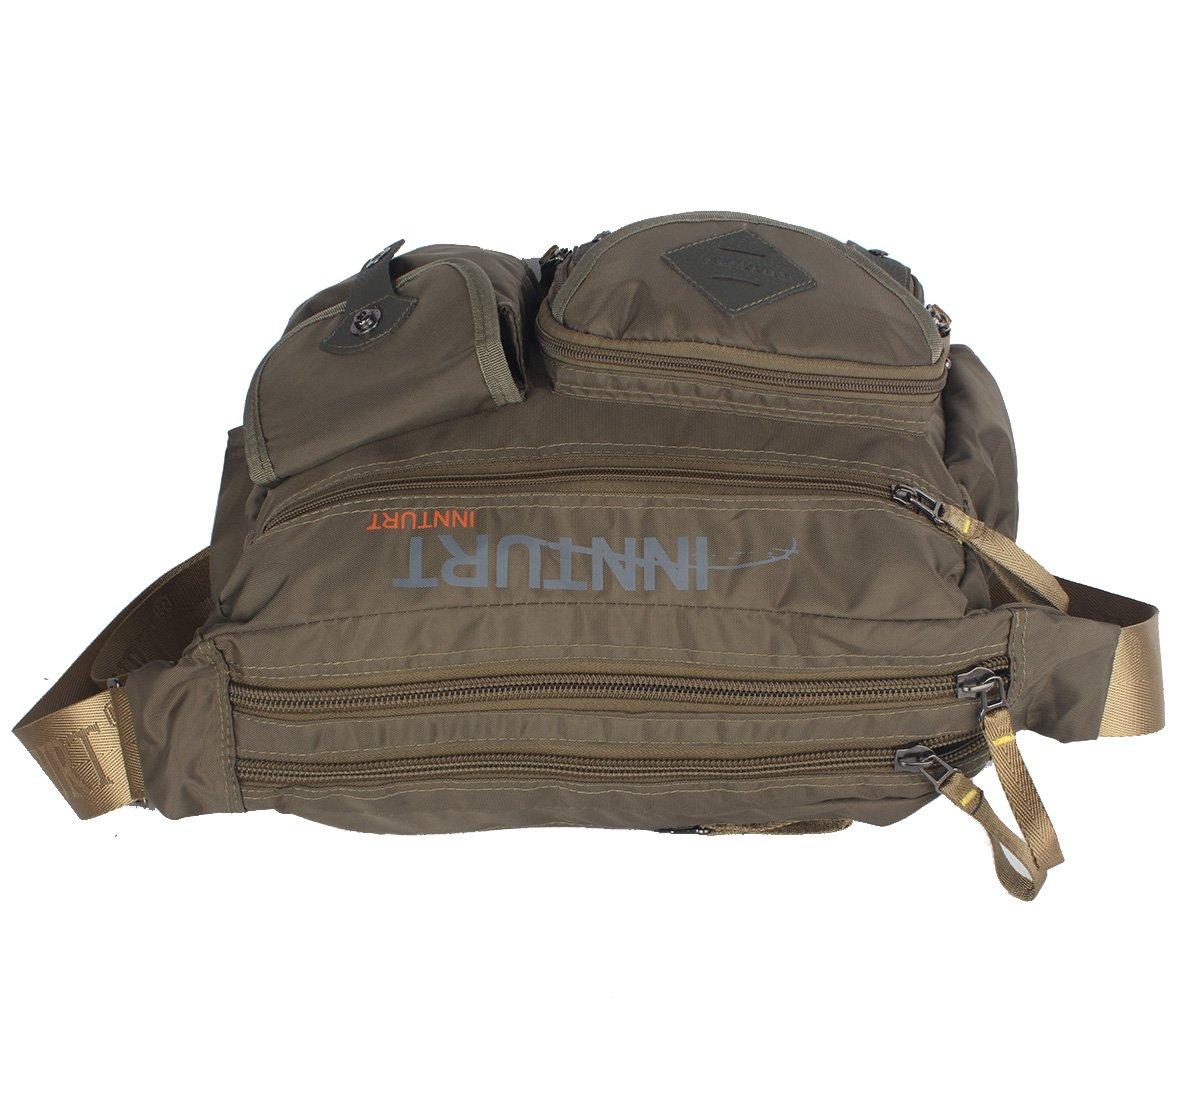 Innturt Nylon Messenger Bag Shoulder Sling Bag Army Green by Innturt (Image #3)